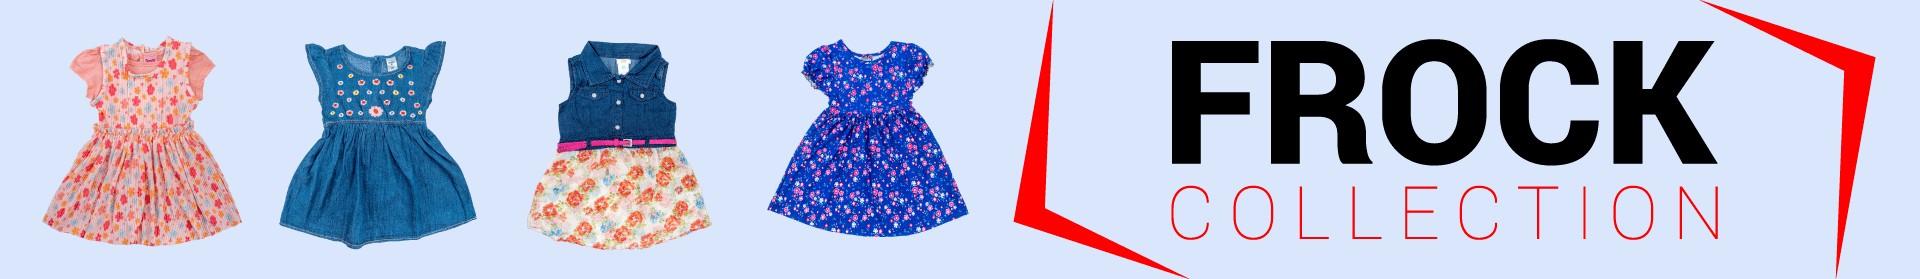 girls_eid_collection_803adf348c8e0575d145b0b2bfadda7b.jpg slide